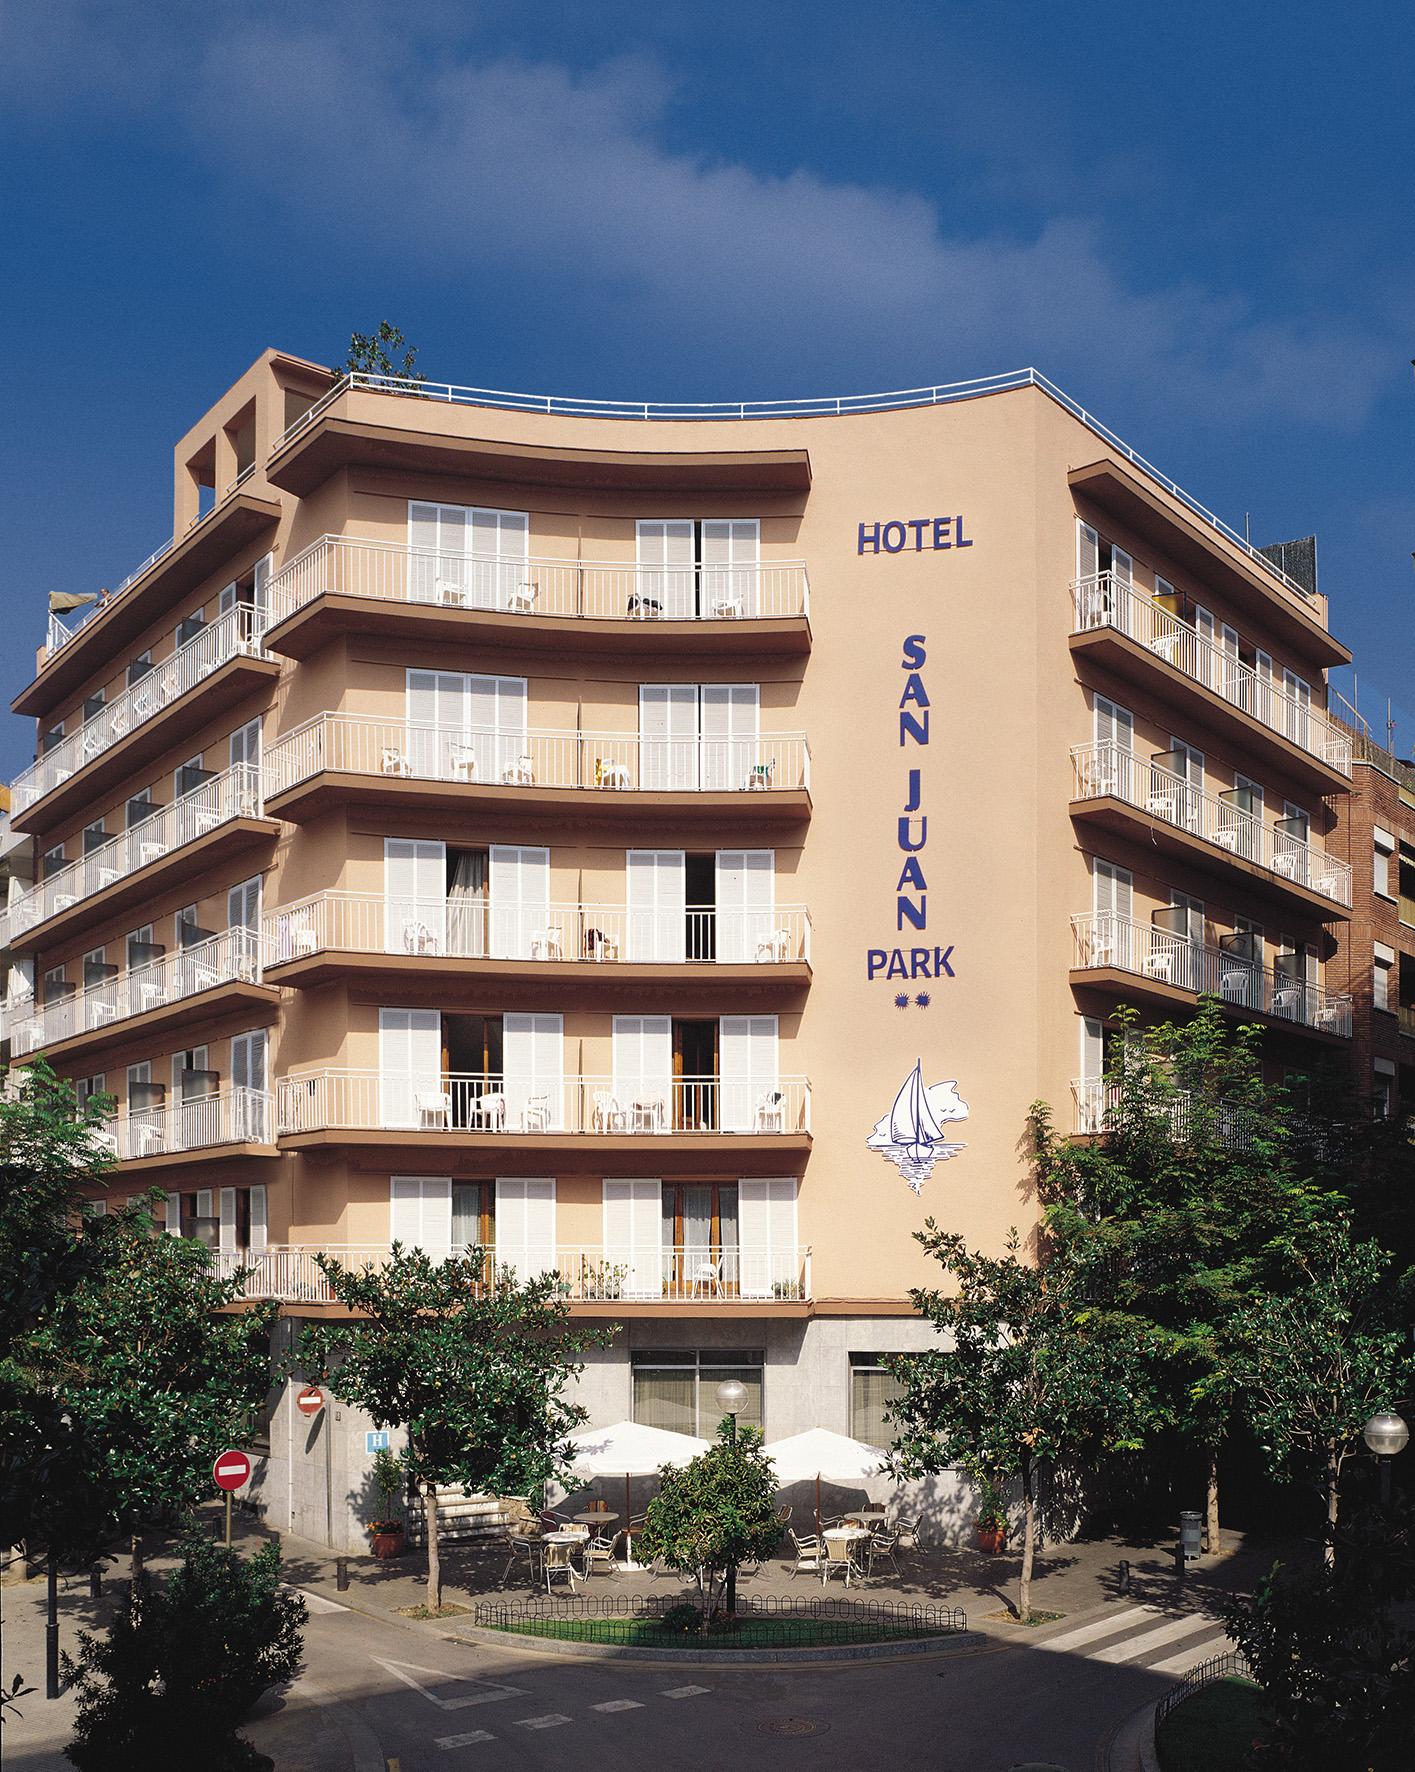 Ljoret de Mar, Hotel San Juan Park ★★